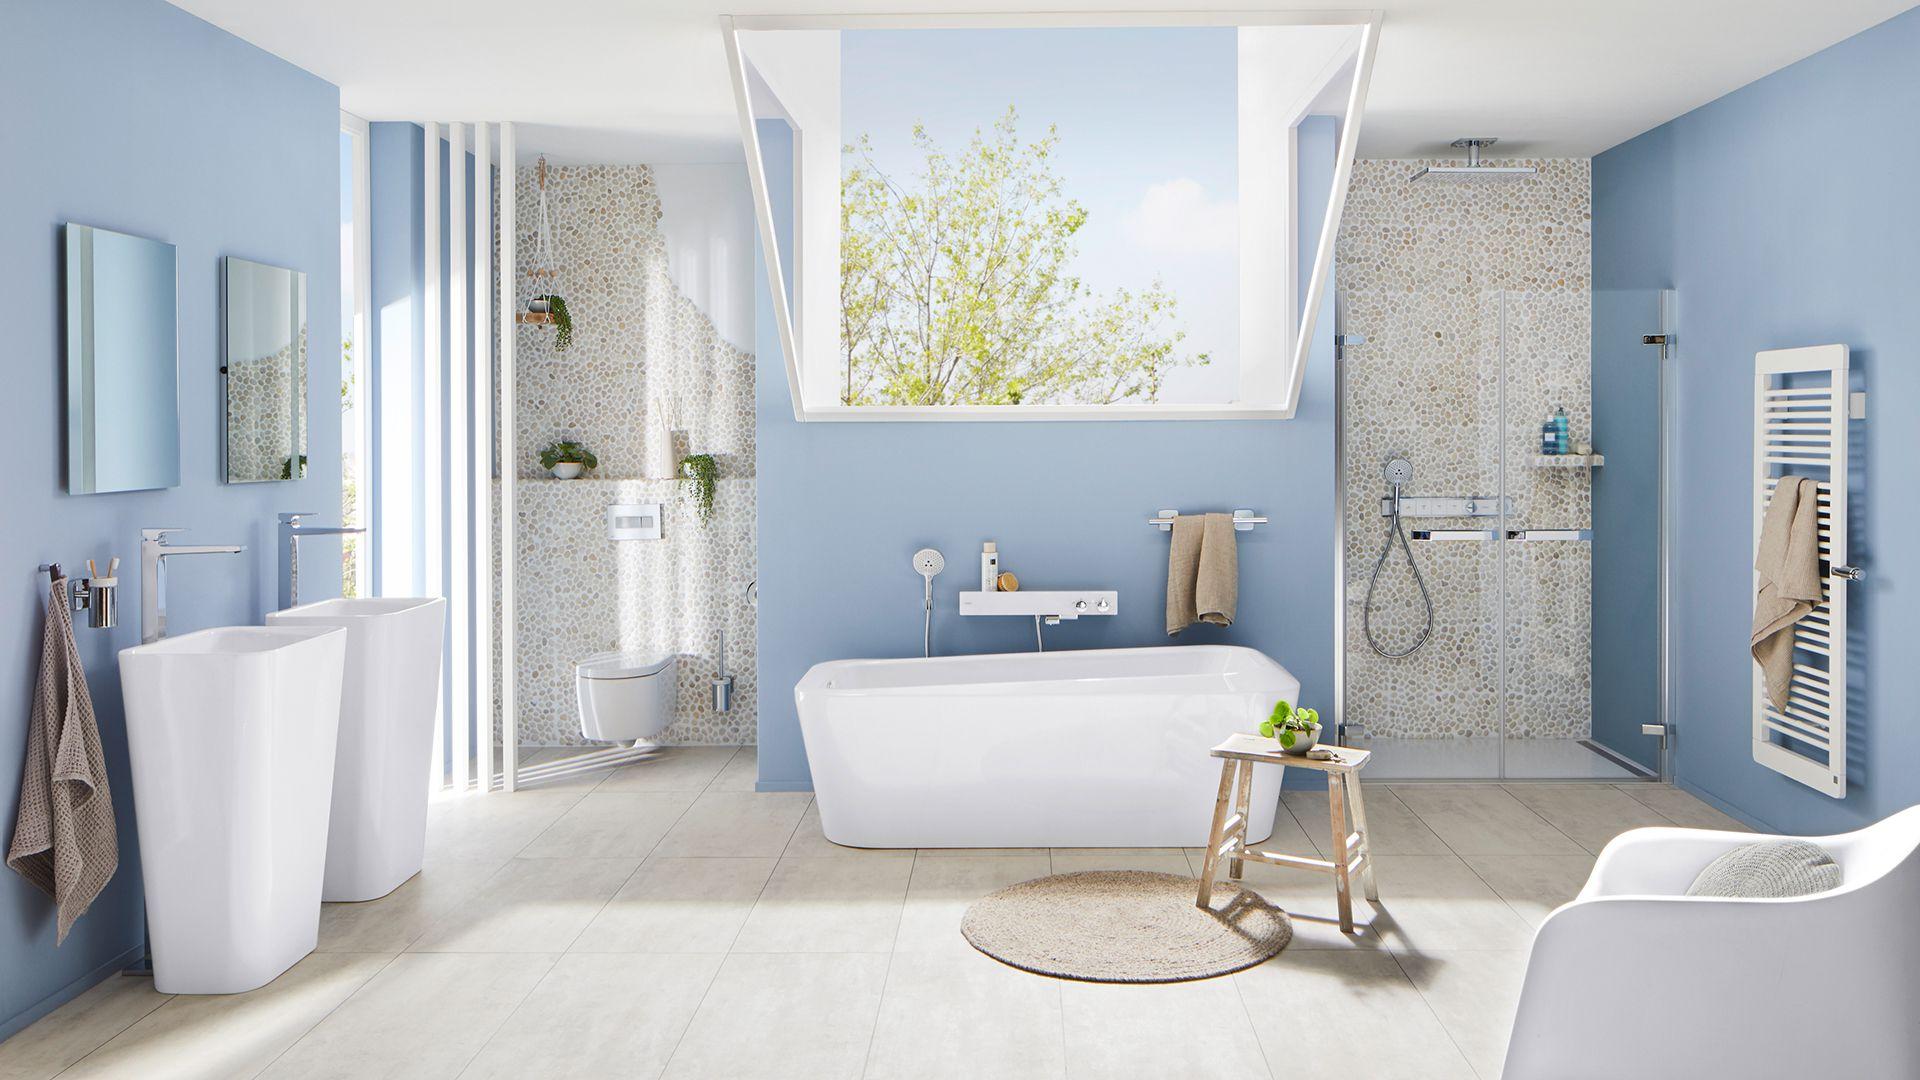 Badezimmer   Ihr Sanitärinstallateur aus Hannover   Köthe Sanitär ...